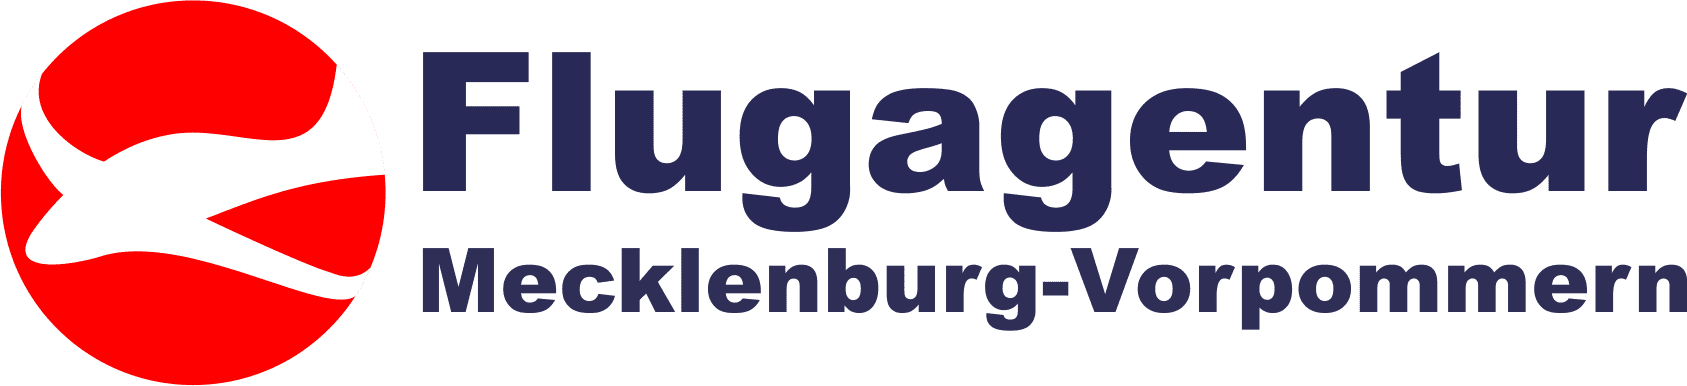 Flugagentur Mecklenburg-Vorpommern MV 1